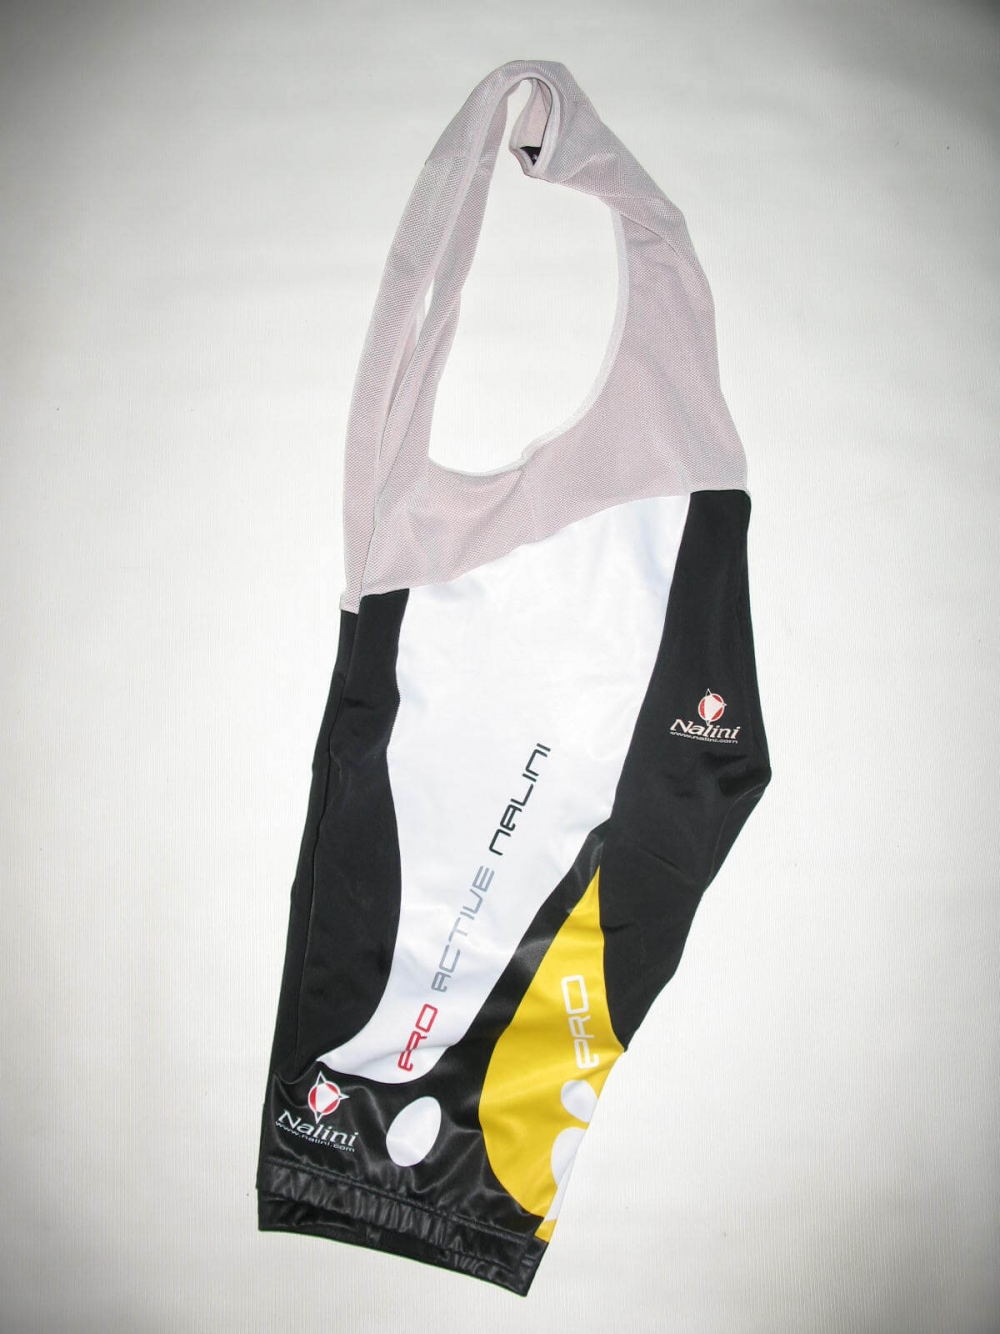 Велошорты NALINI pro active bib shorts (размер XL/L) - 1